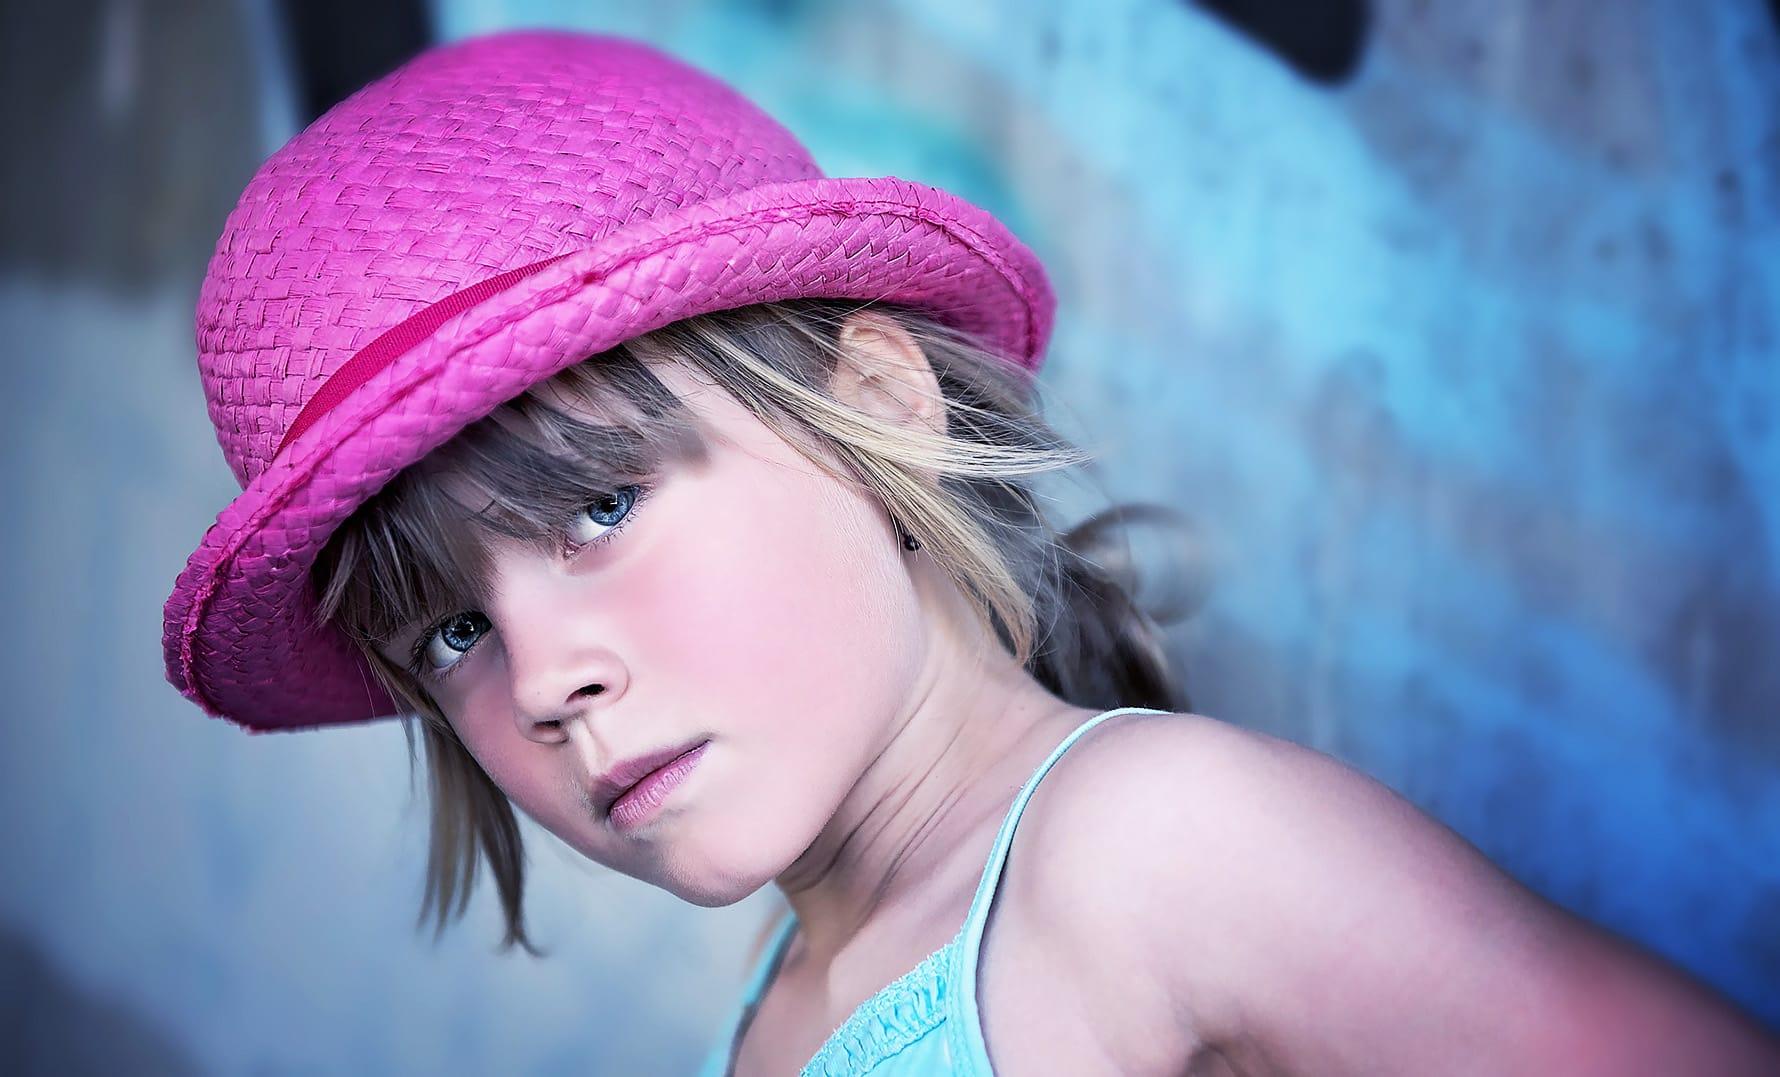 frajerka z očarljivim klobukom